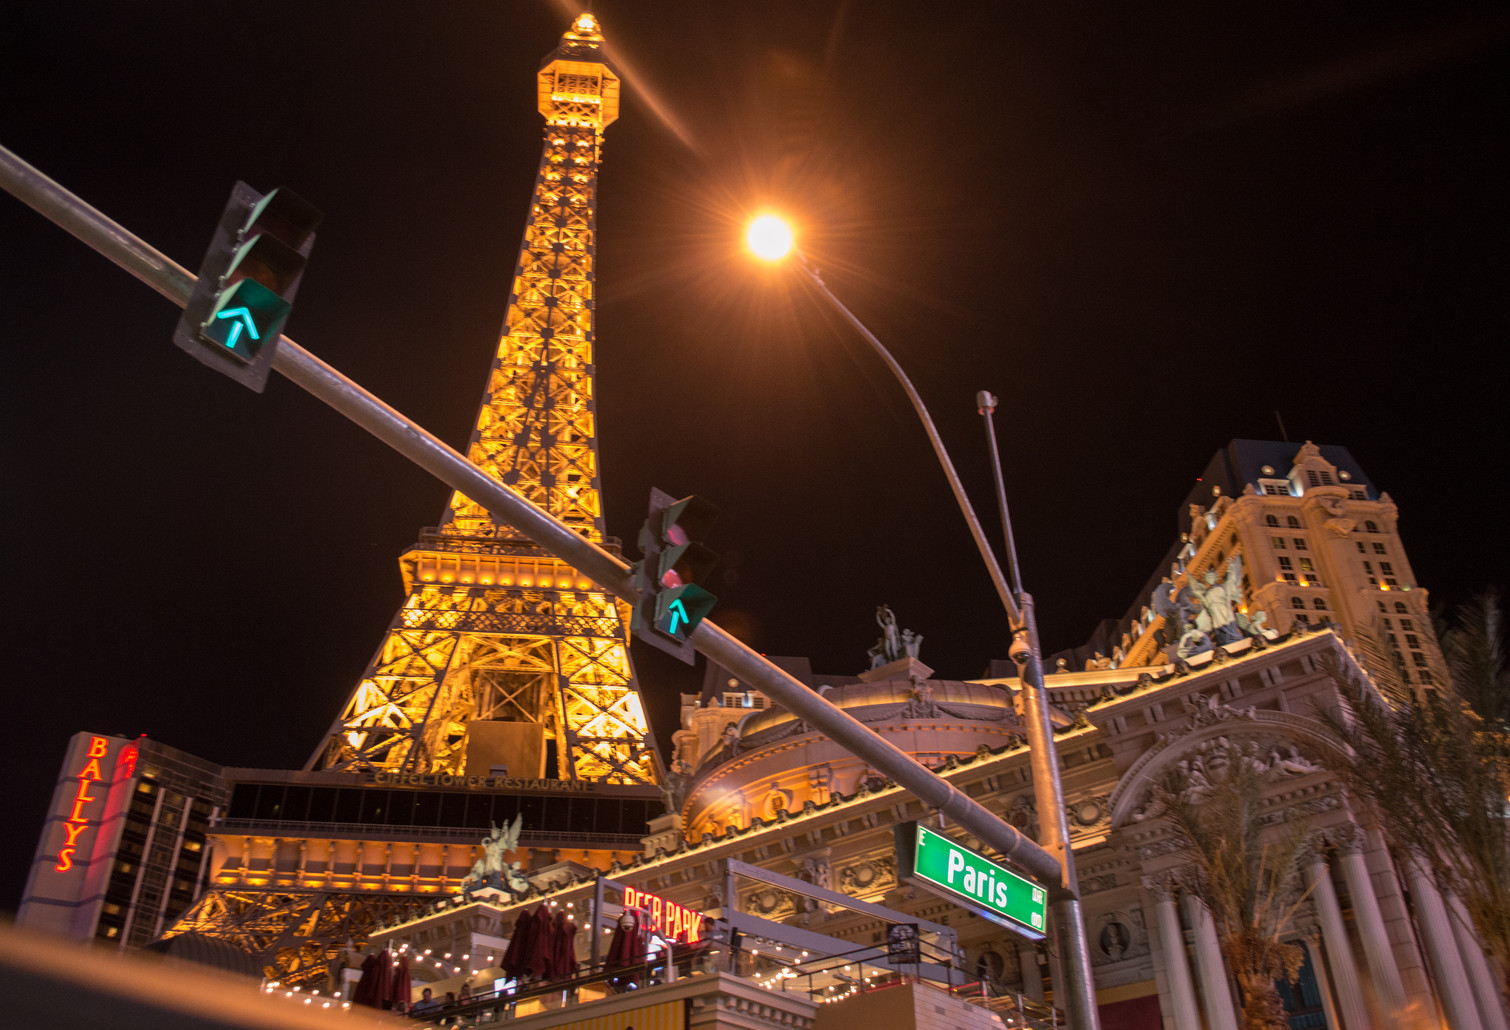 Paris, Las Vegas.